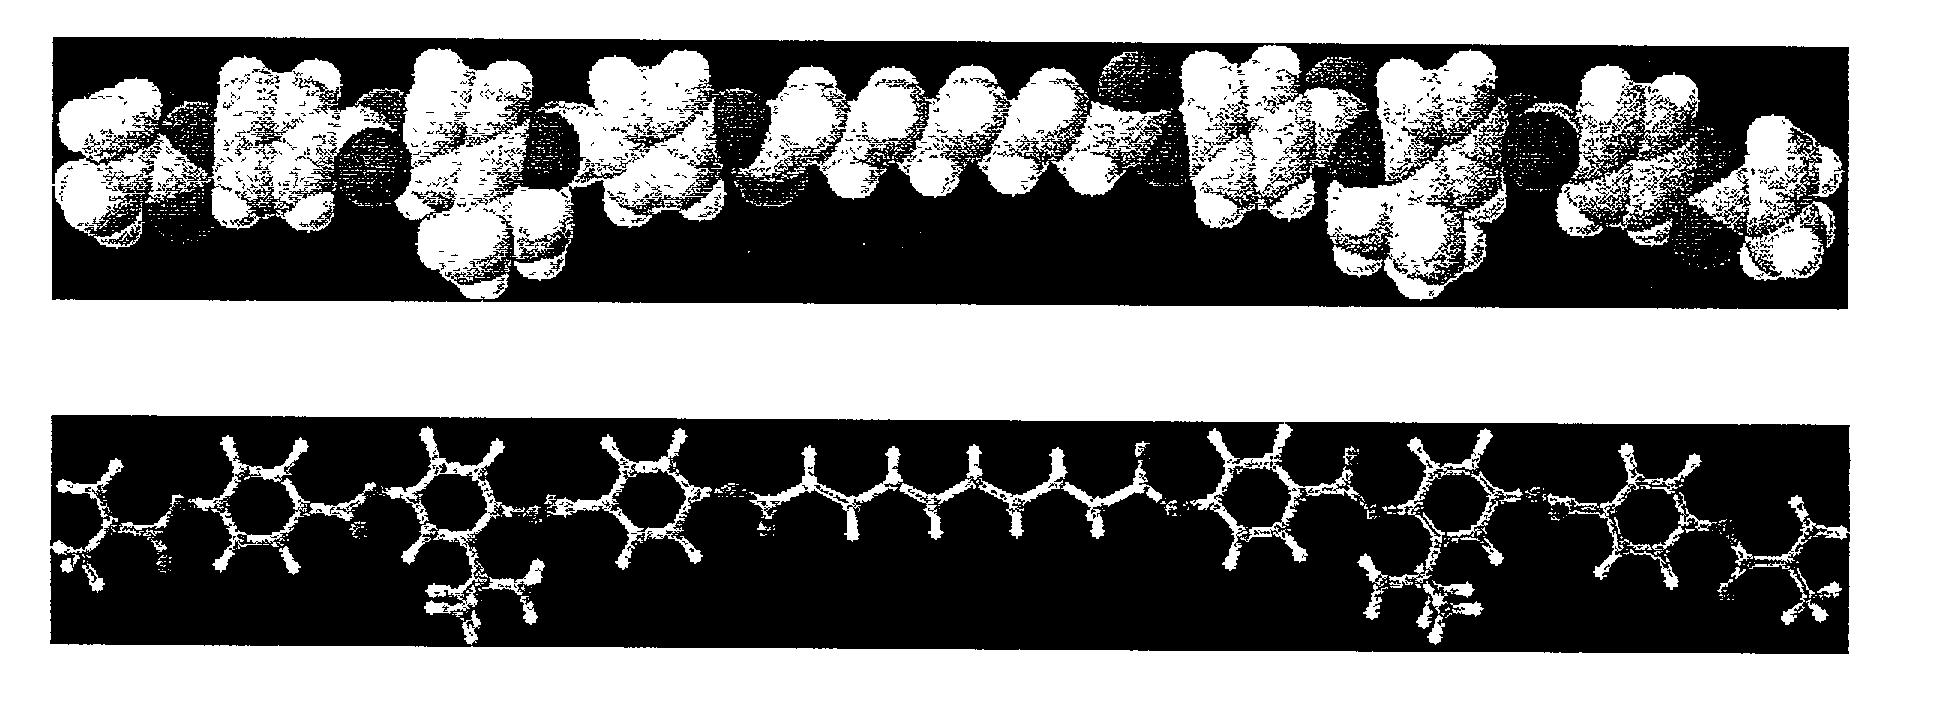 Figure US20030036609A1-20030220-P00001